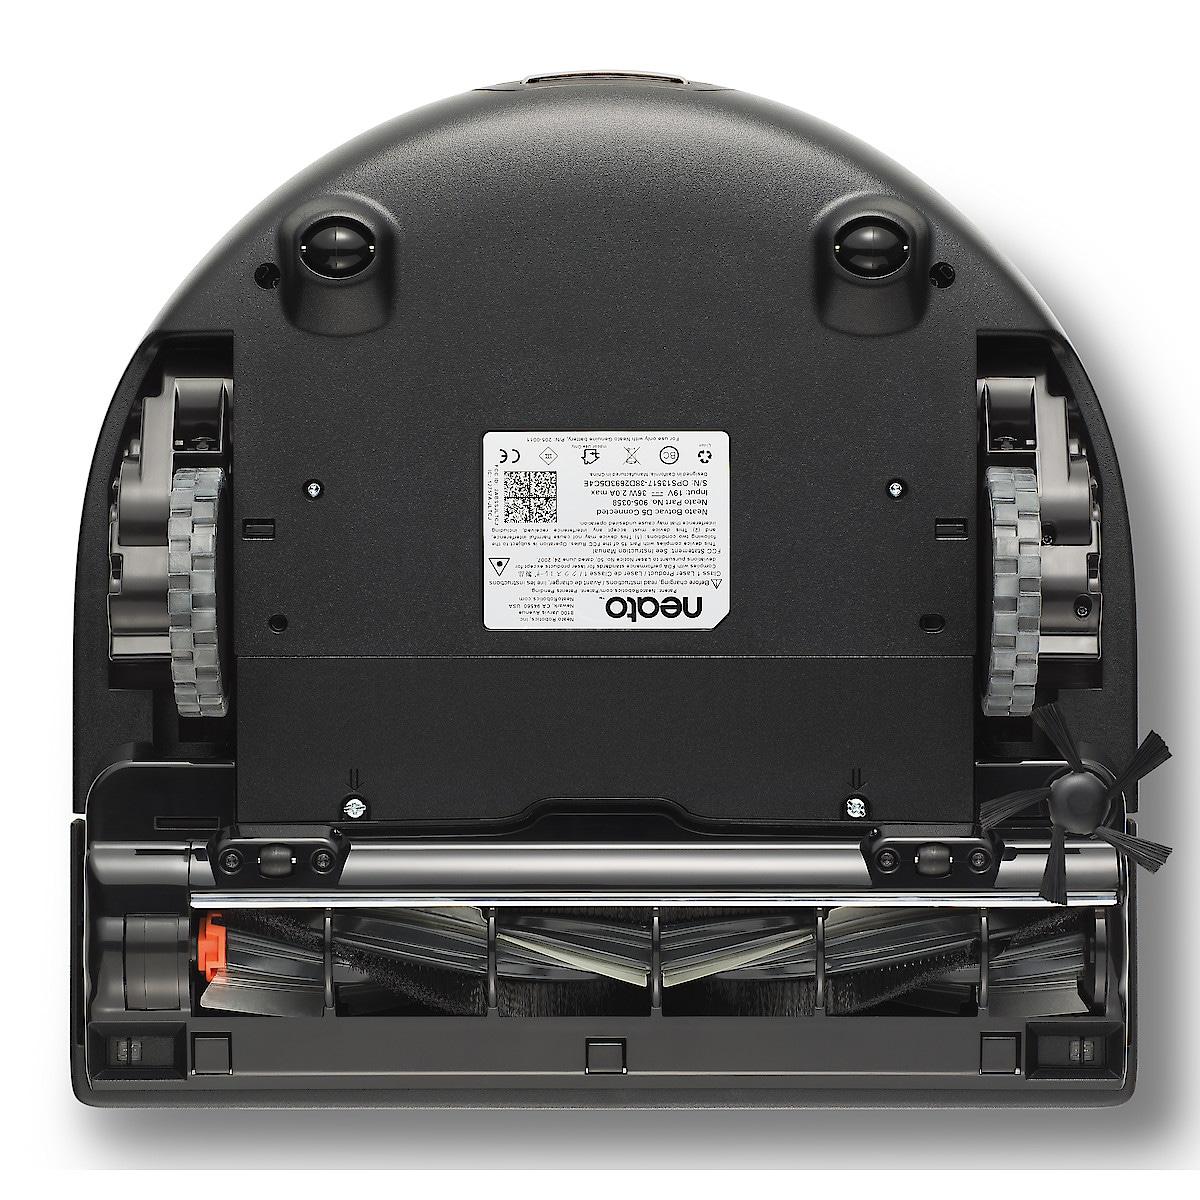 Robotdammsugare Neato Botvac D7 Connected